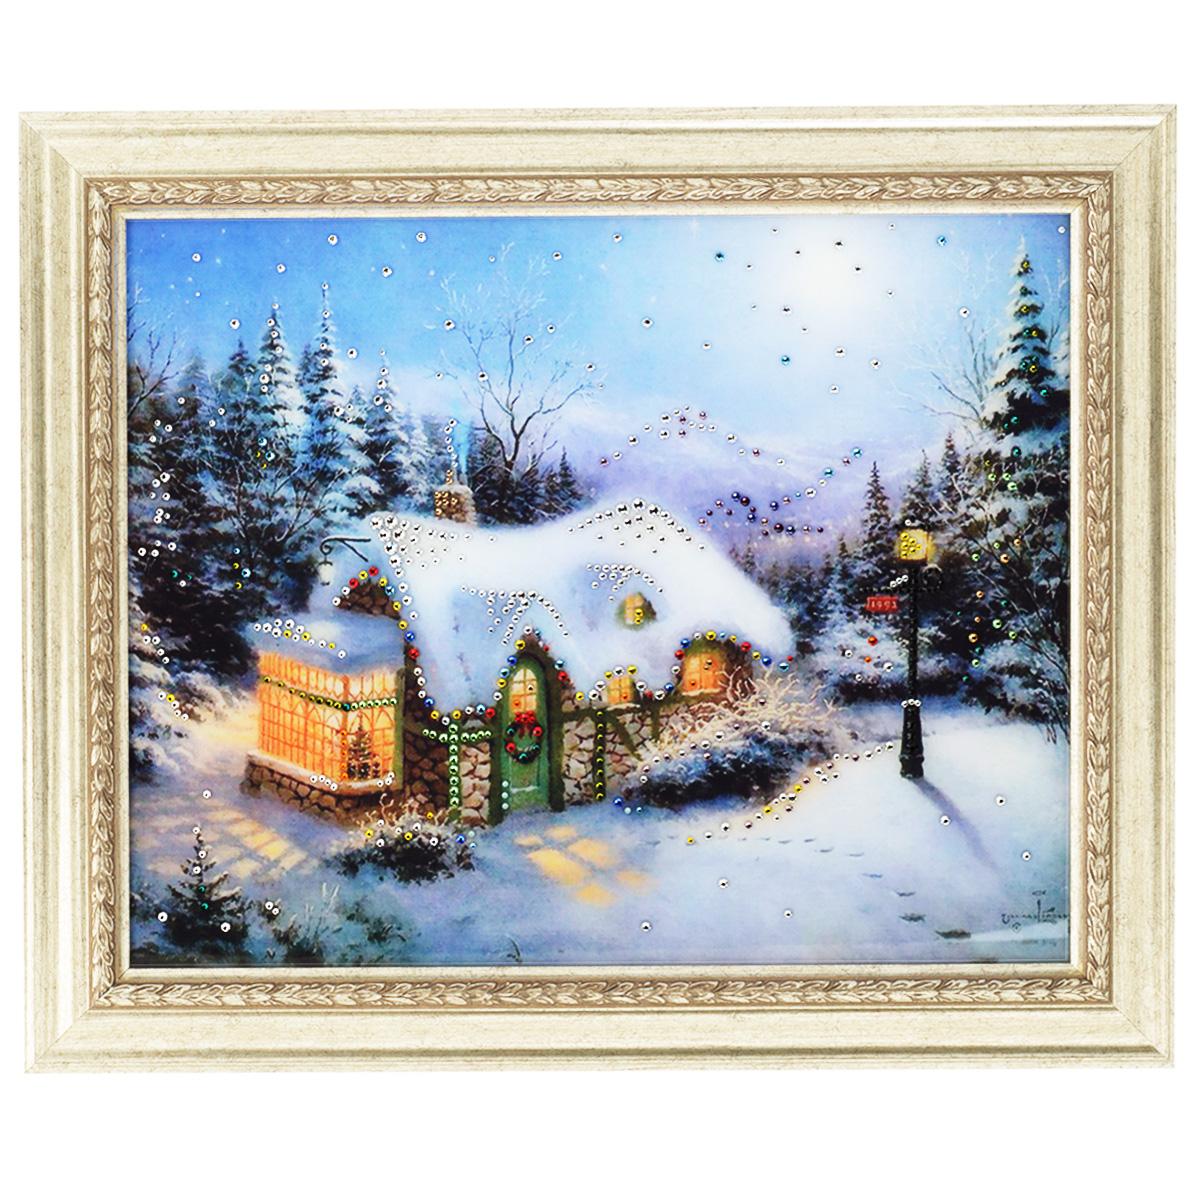 Картина с кристаллами Swarovski Рождество, 60 х 50 см картины в квартиру картина etude 2 102х130 см